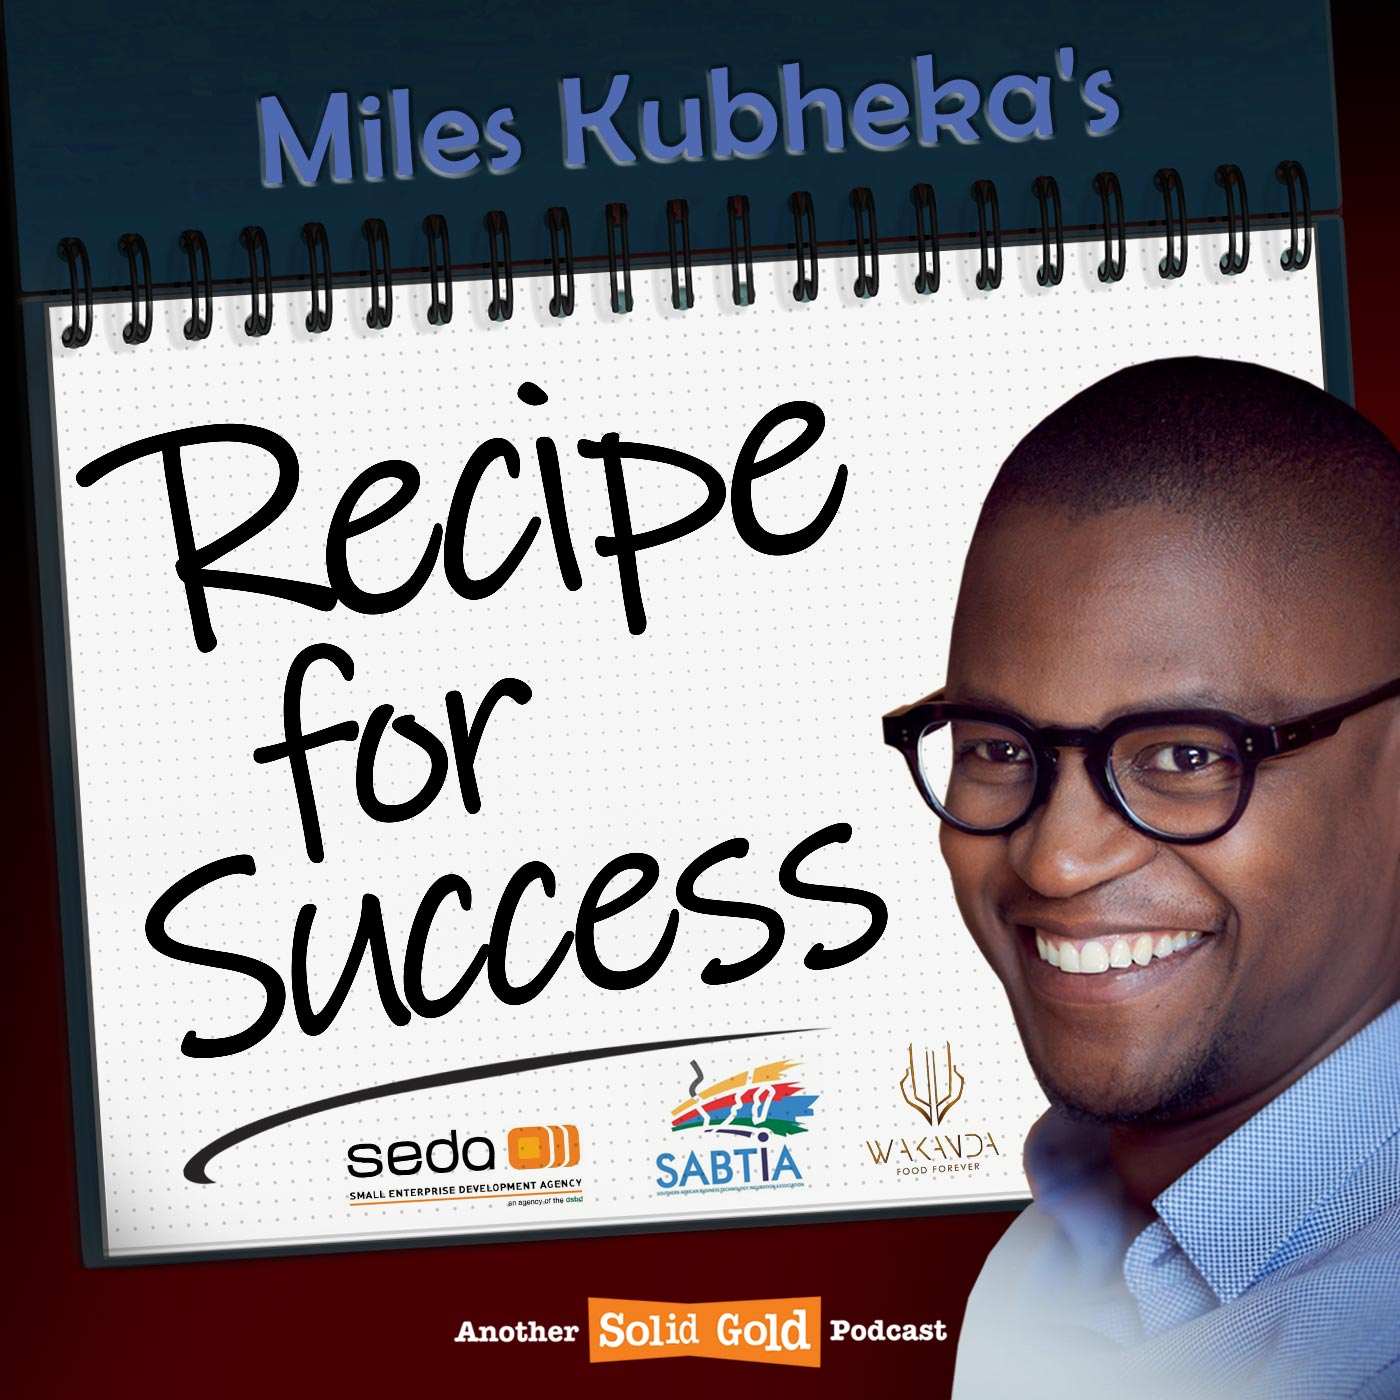 Recipe for Success with Miles Kubheka